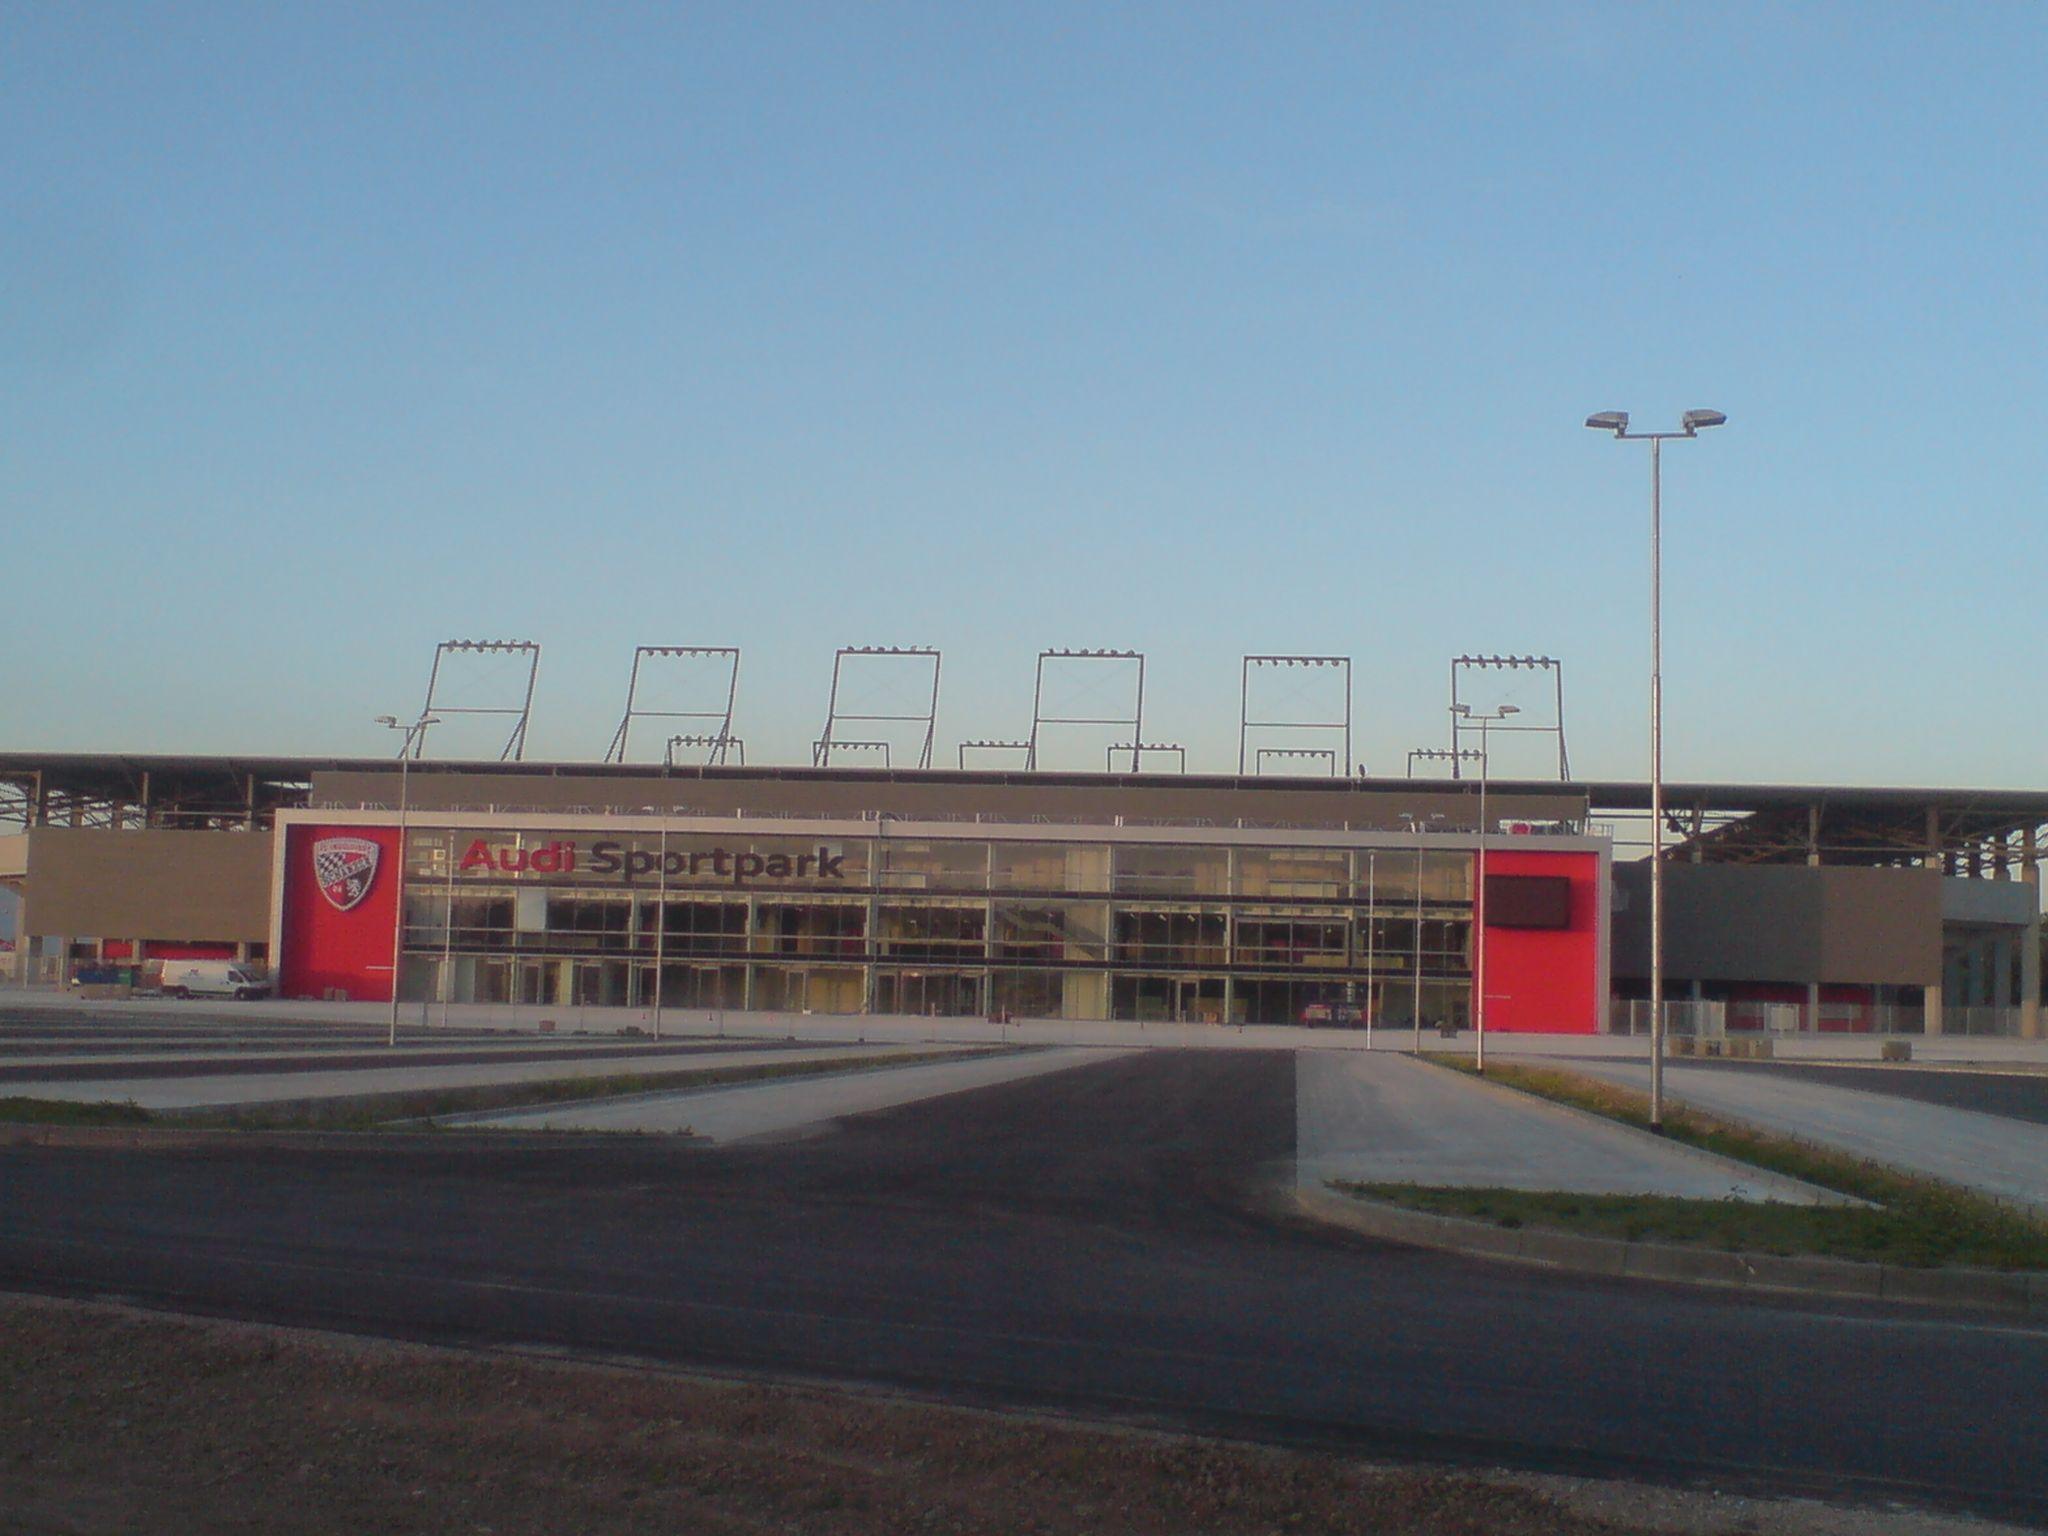 Description AudiSportpark.jpg My sports interest also